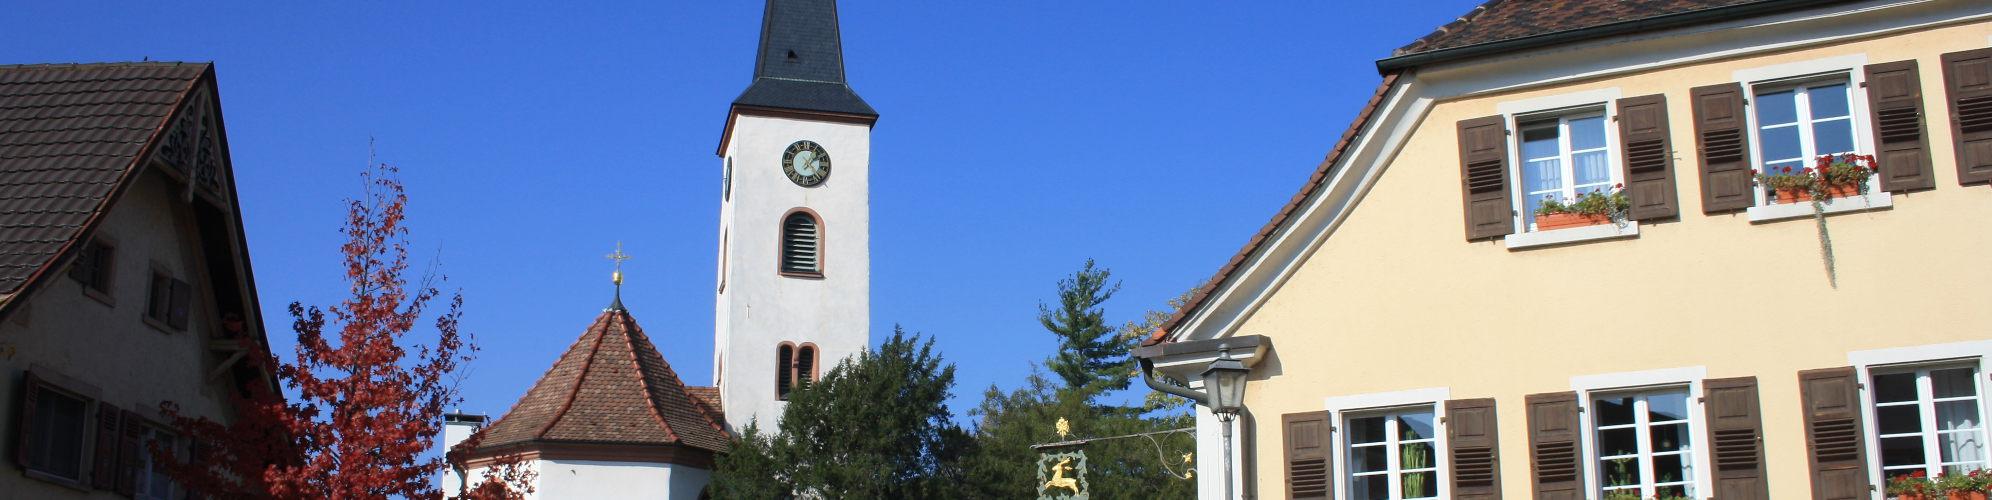 Ortsmitt Oberrimsingen